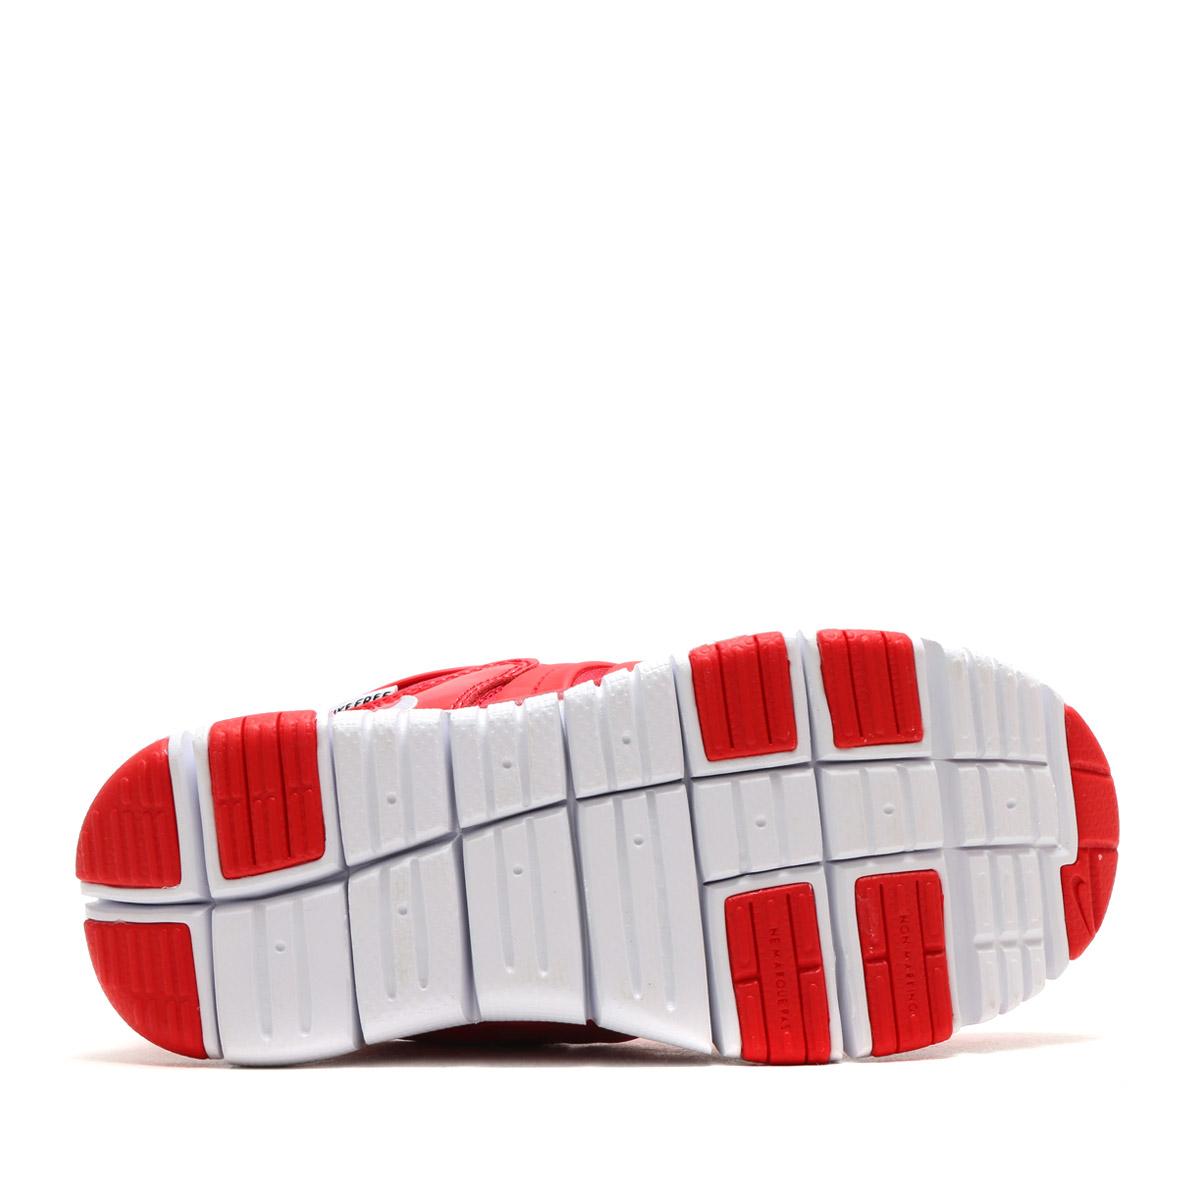 a5c80e90279b NIKE DYNAMO FREE (PS) (Nike dynamo-free PS) TOUGH RED WHITE-UNIVERSITY RED  17FA-I